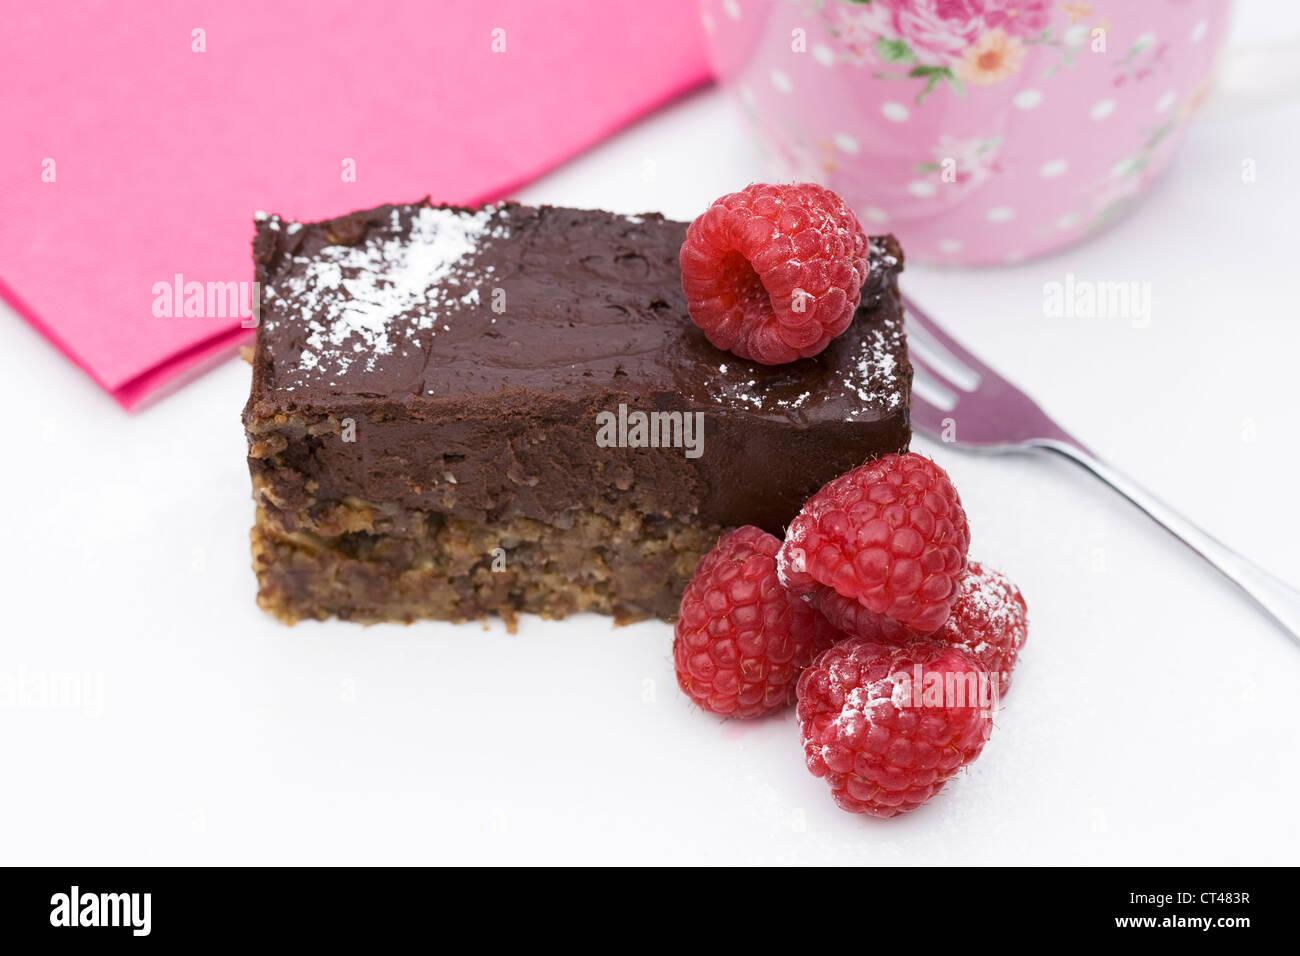 A slice of raw chocolate tart with raspberries. - Stock Image